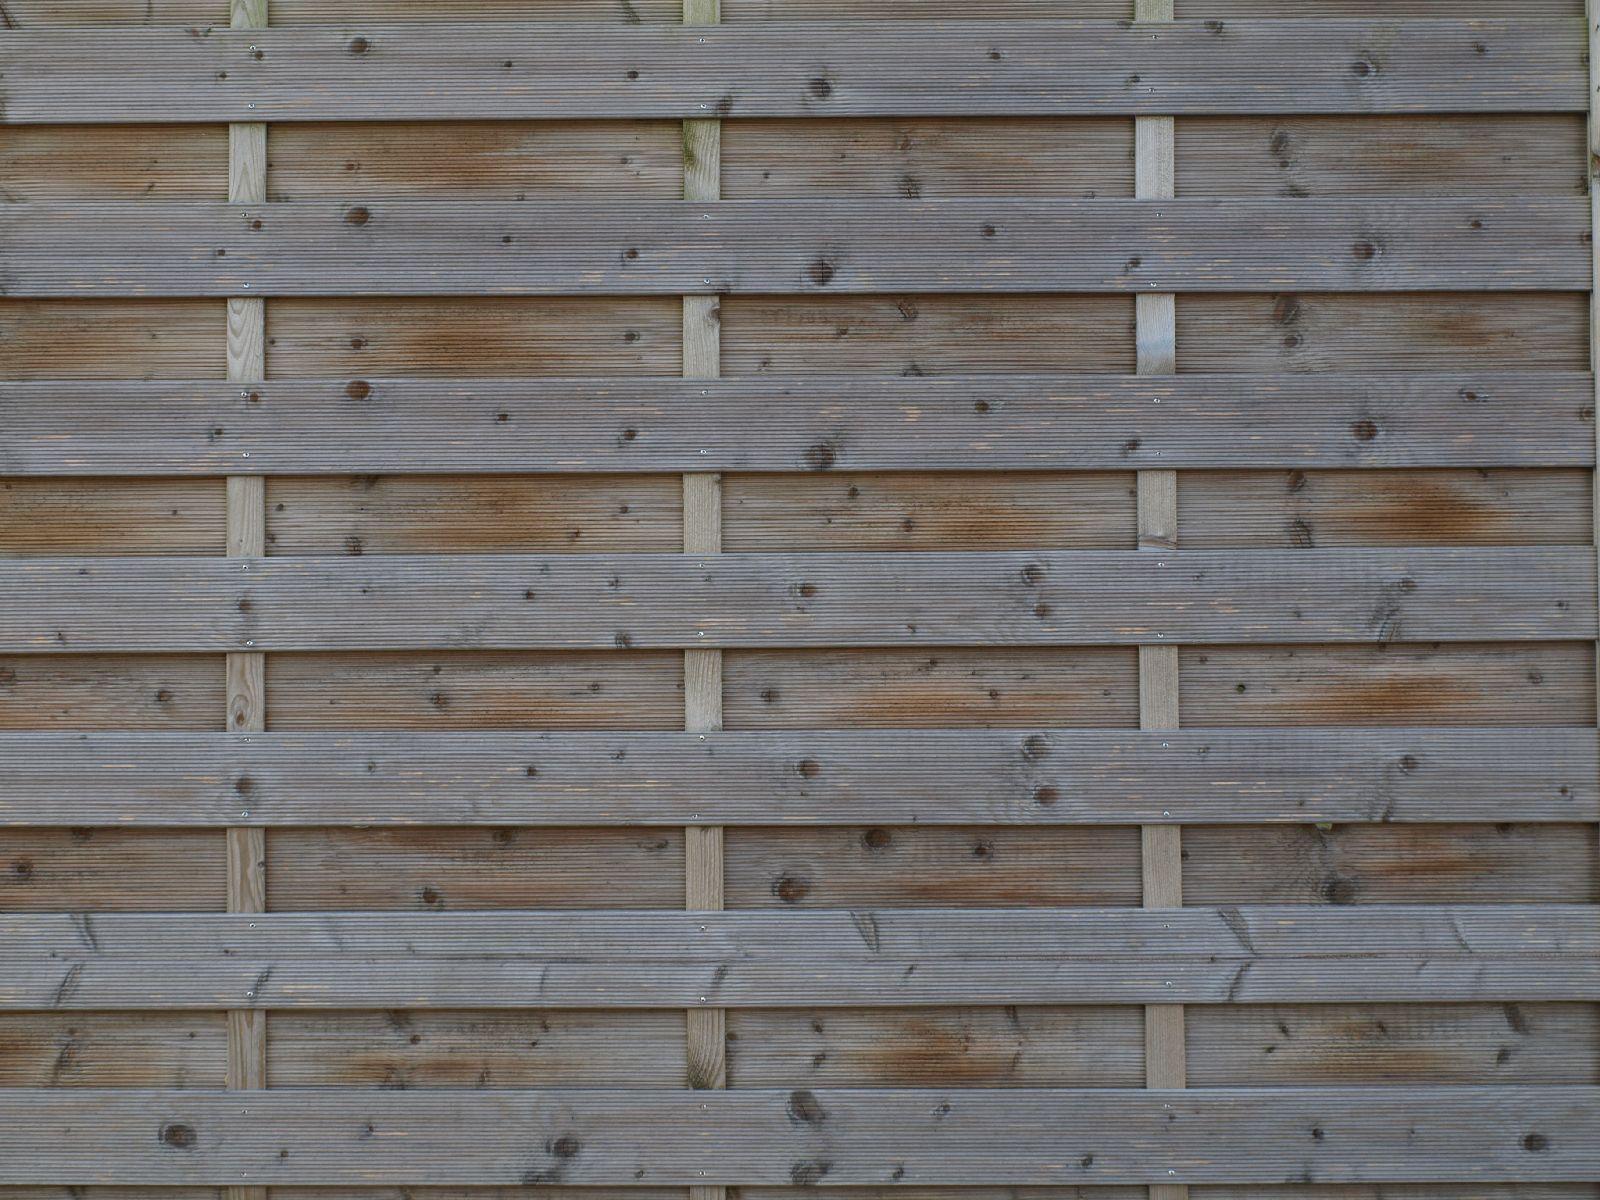 Wood_Texture_A_P6143360